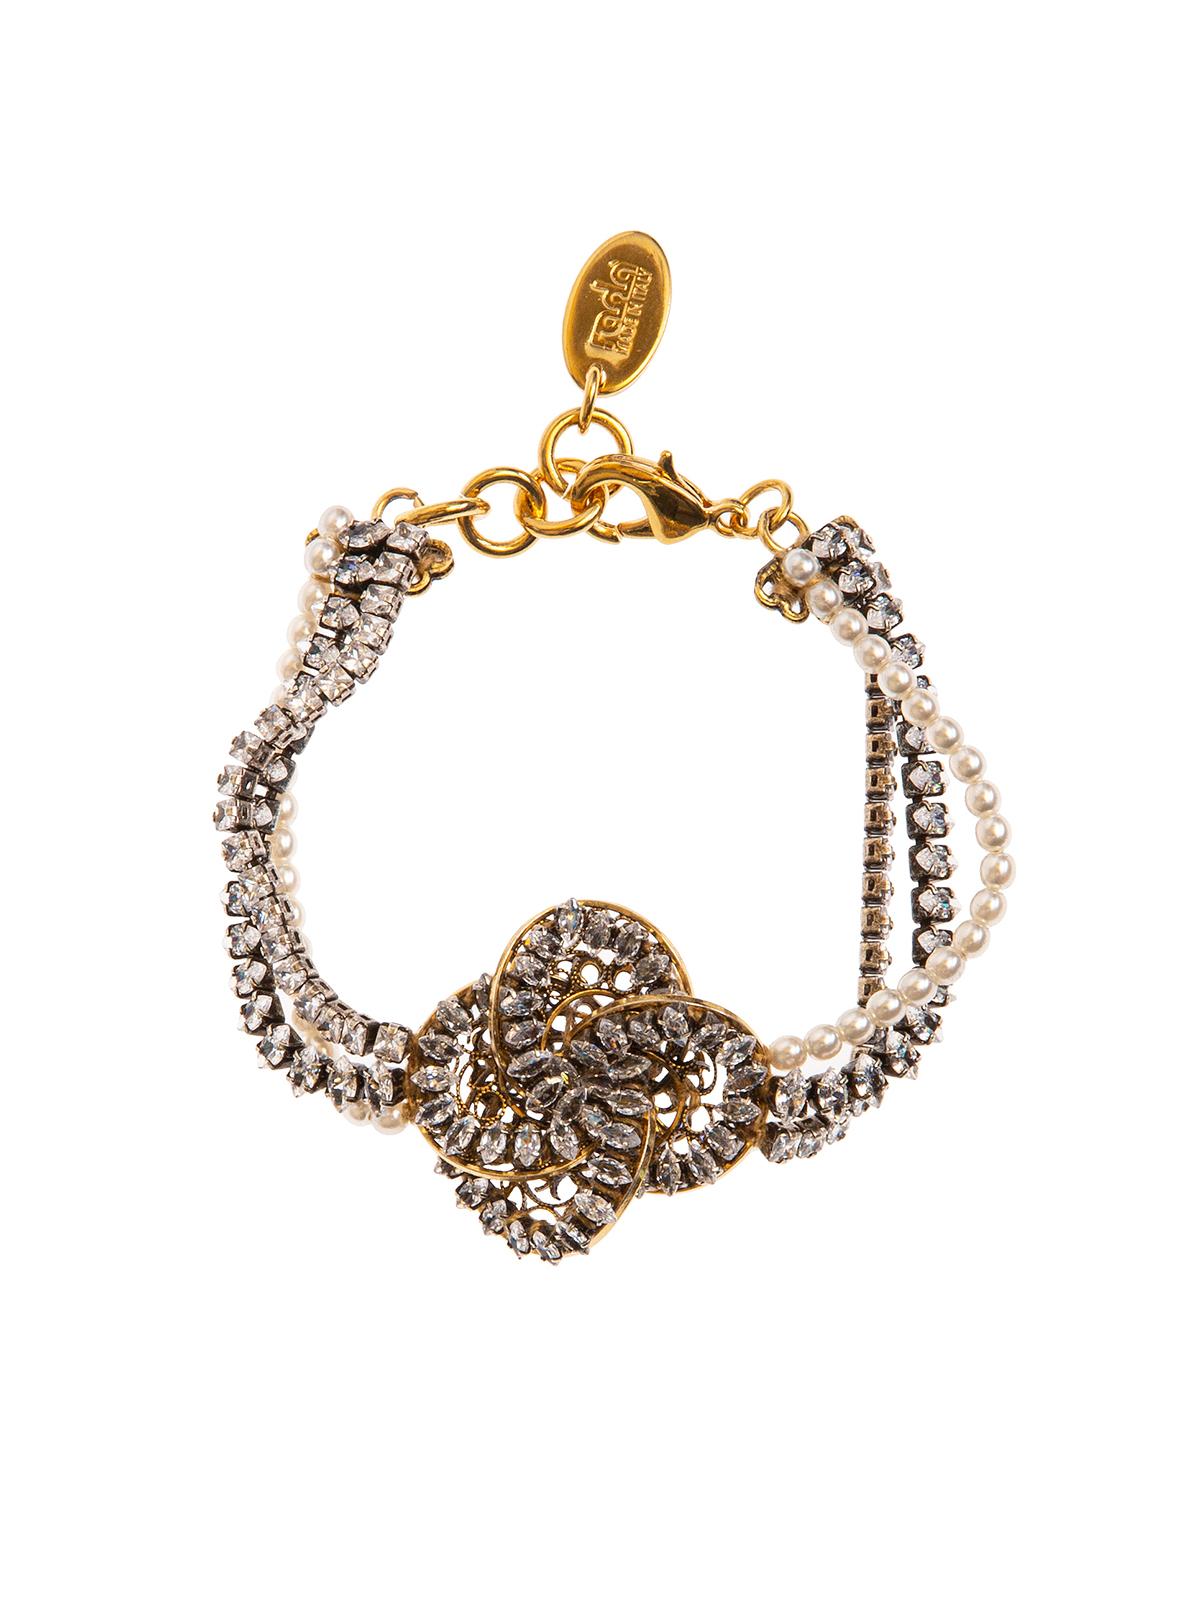 Bead and crystal bracelet with  jewel pinwheel decoration